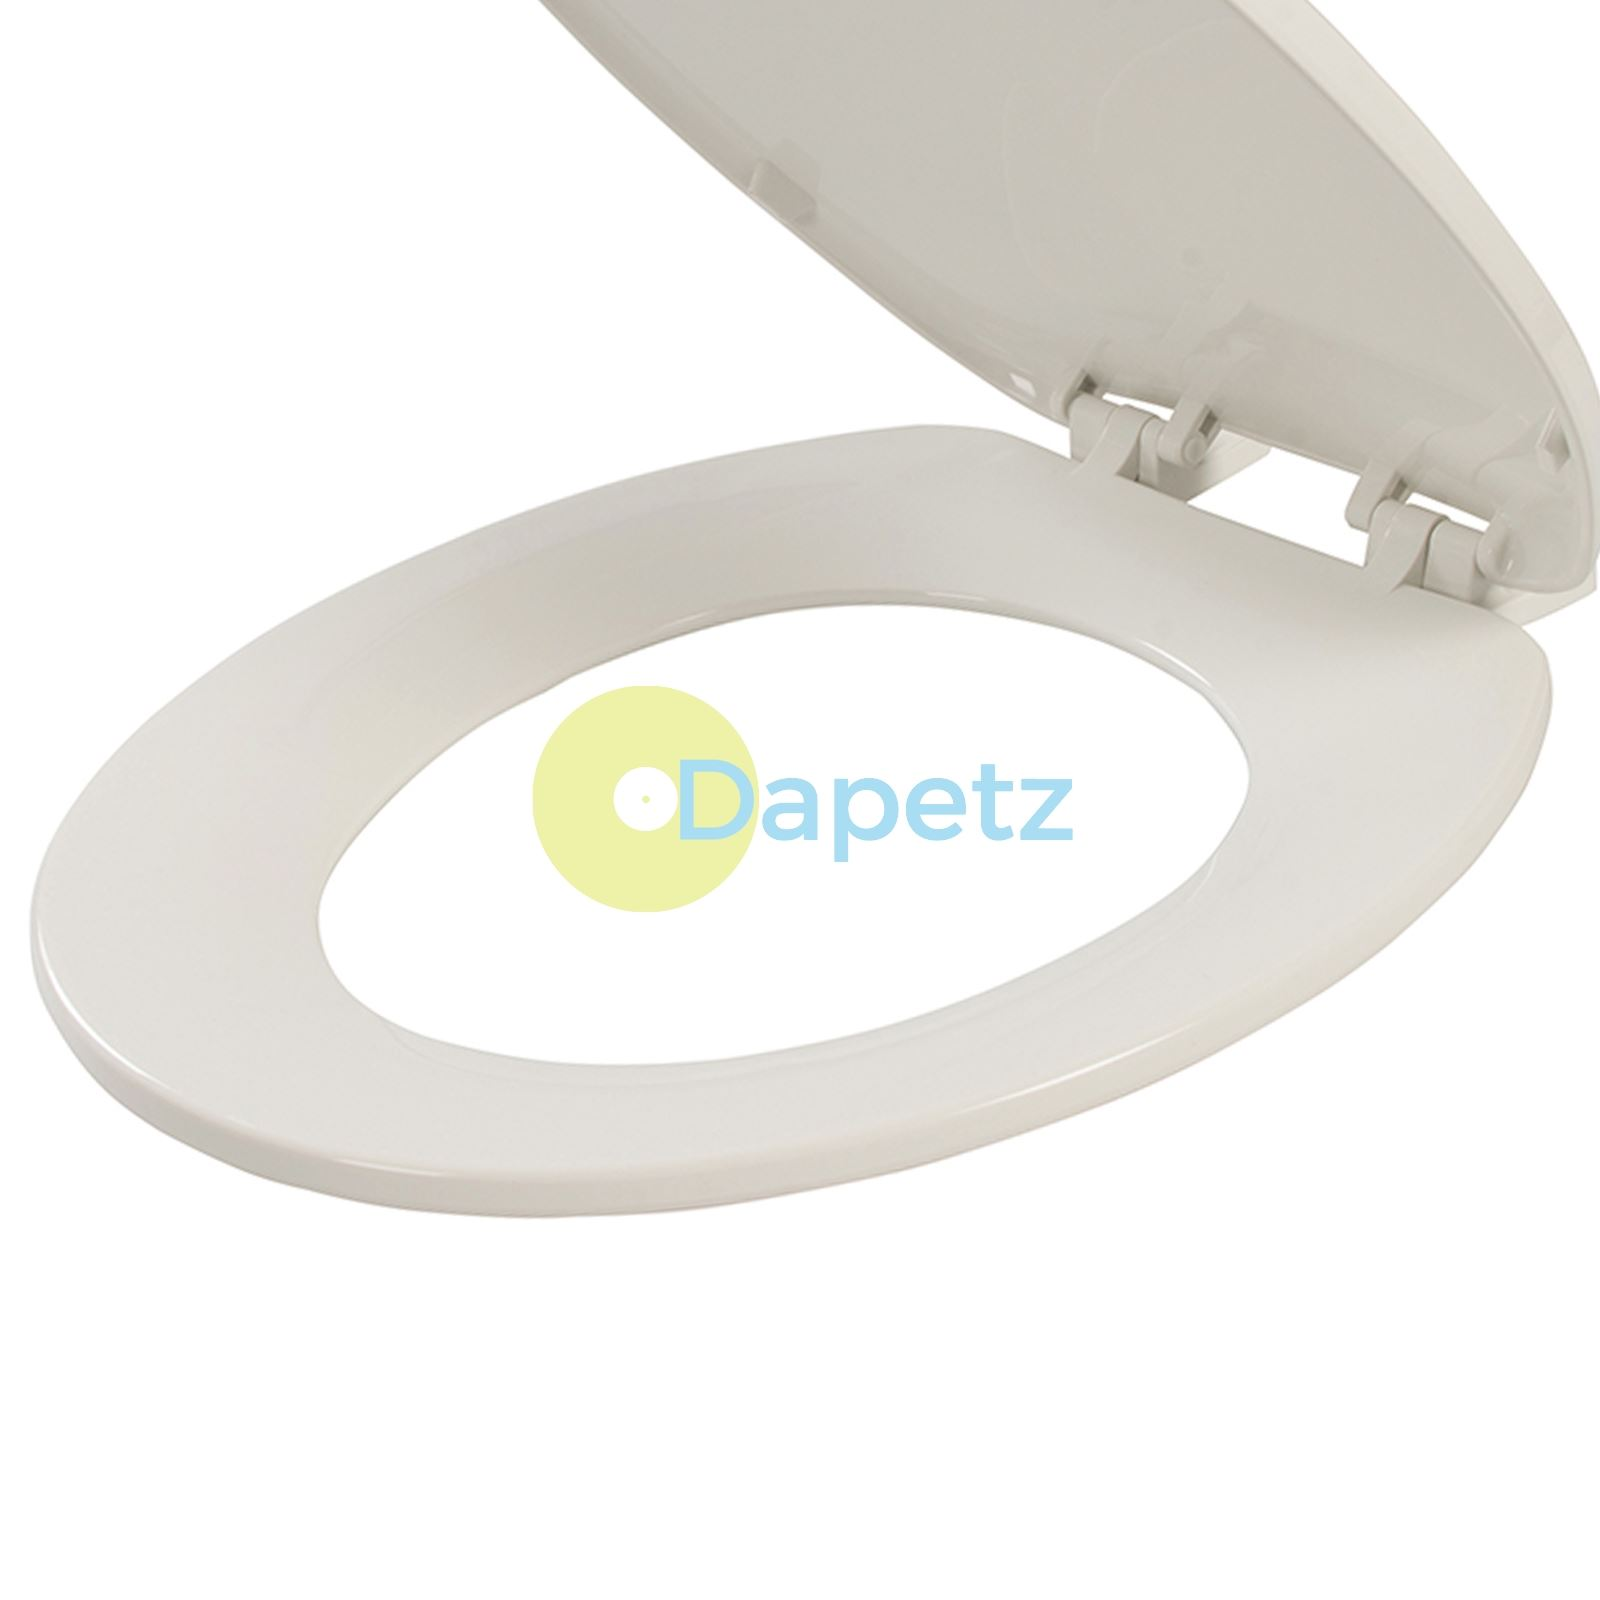 BRAND NEW LUXURY BATHROOM SLOW SOFT CLOSE WHITE TOILET SEAT SEATS WC HEAVY DUTY